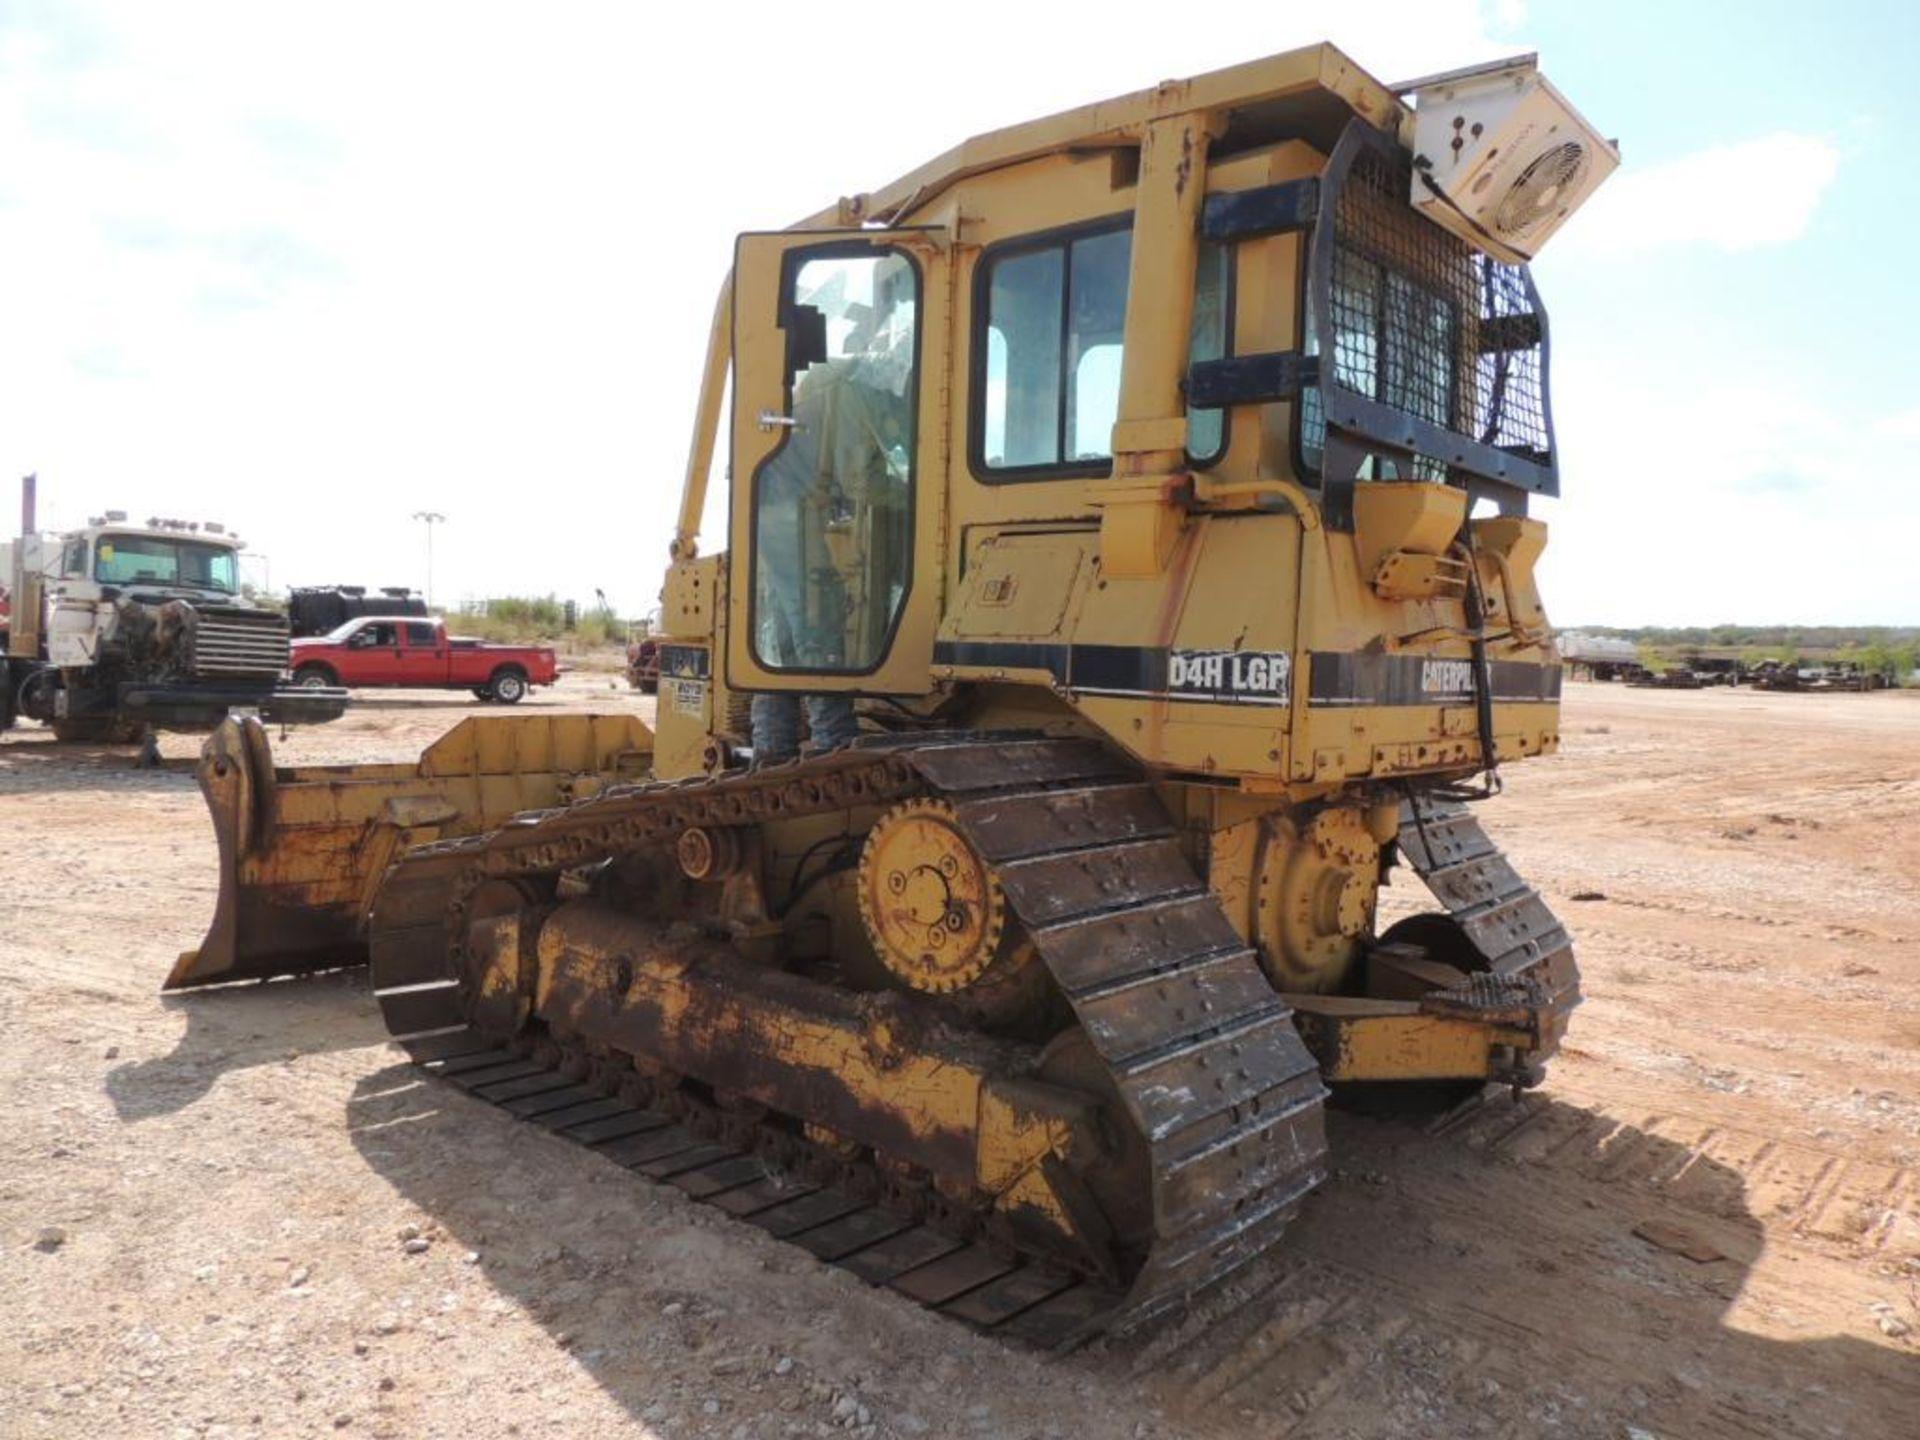 1996 Caterpillar D4H-LGP Series III Crawler Tractor, 6 Way Blade, 30 In. Grousers, 7570 Hrs. - Image 4 of 4